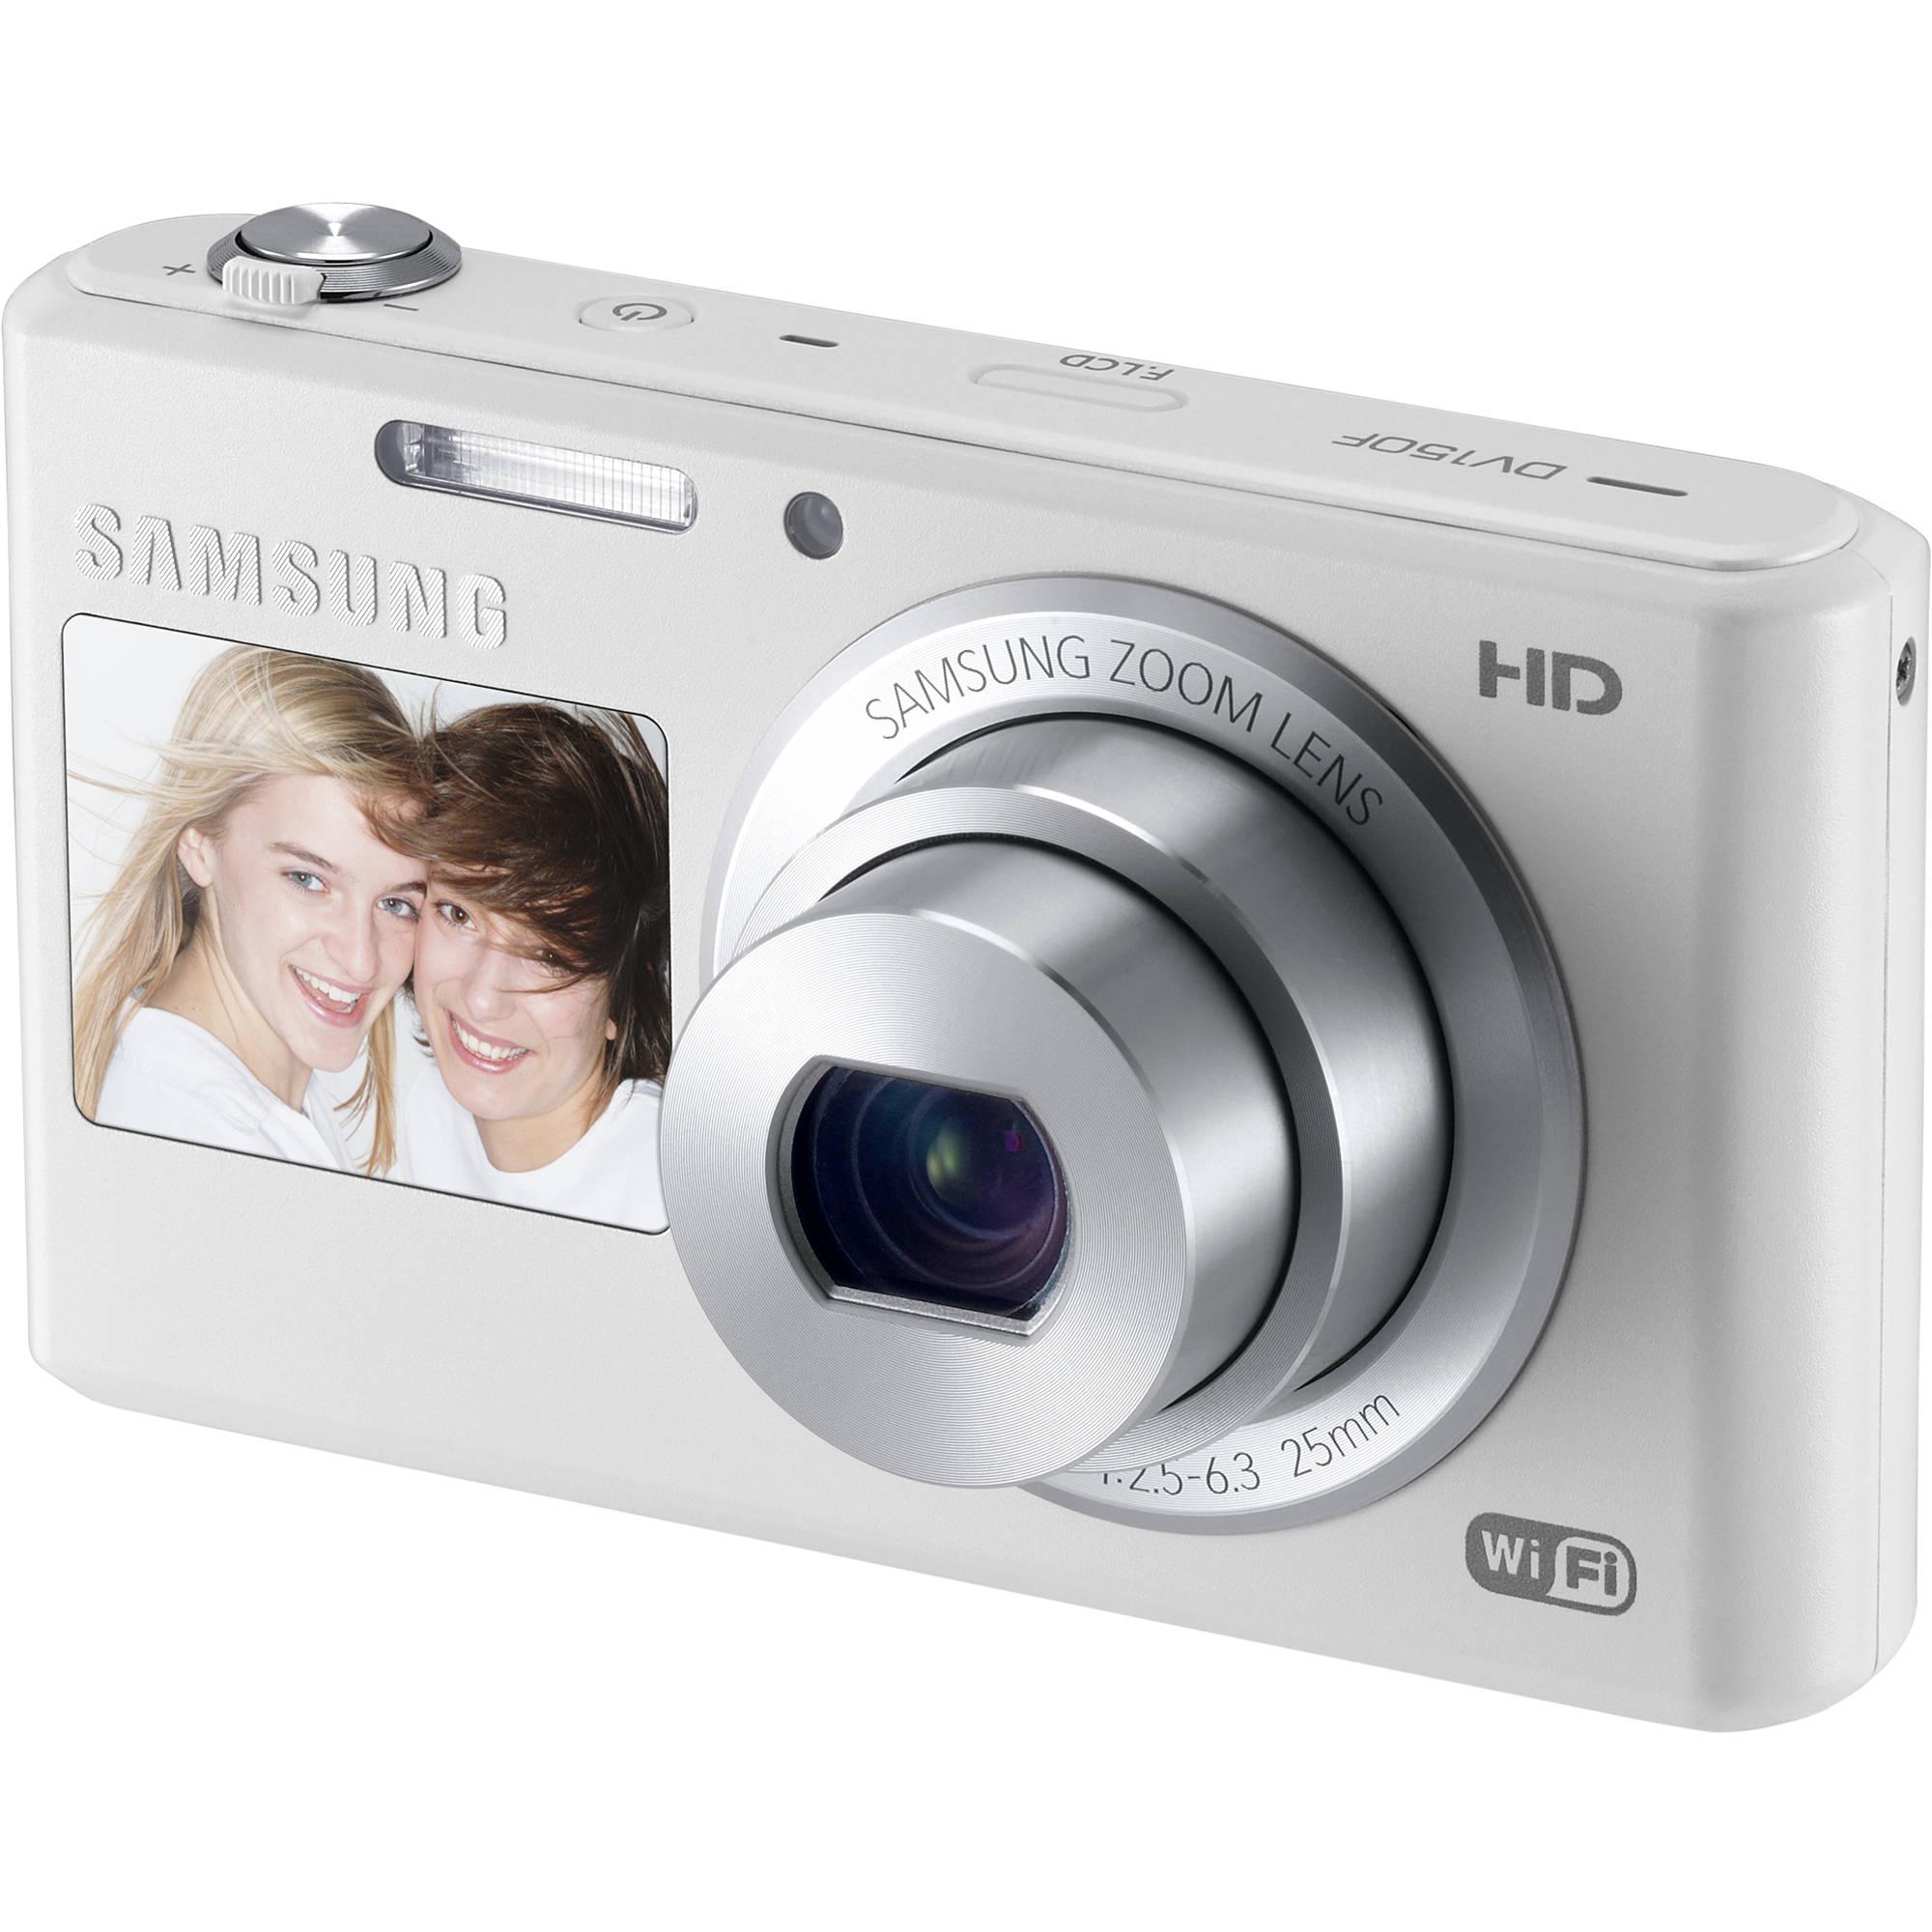 samsung dv150f dual view smart digital camera ec dv150fbpwus b h rh bhphotovideo com Samsung Smart Camera Samsung Smart Camera